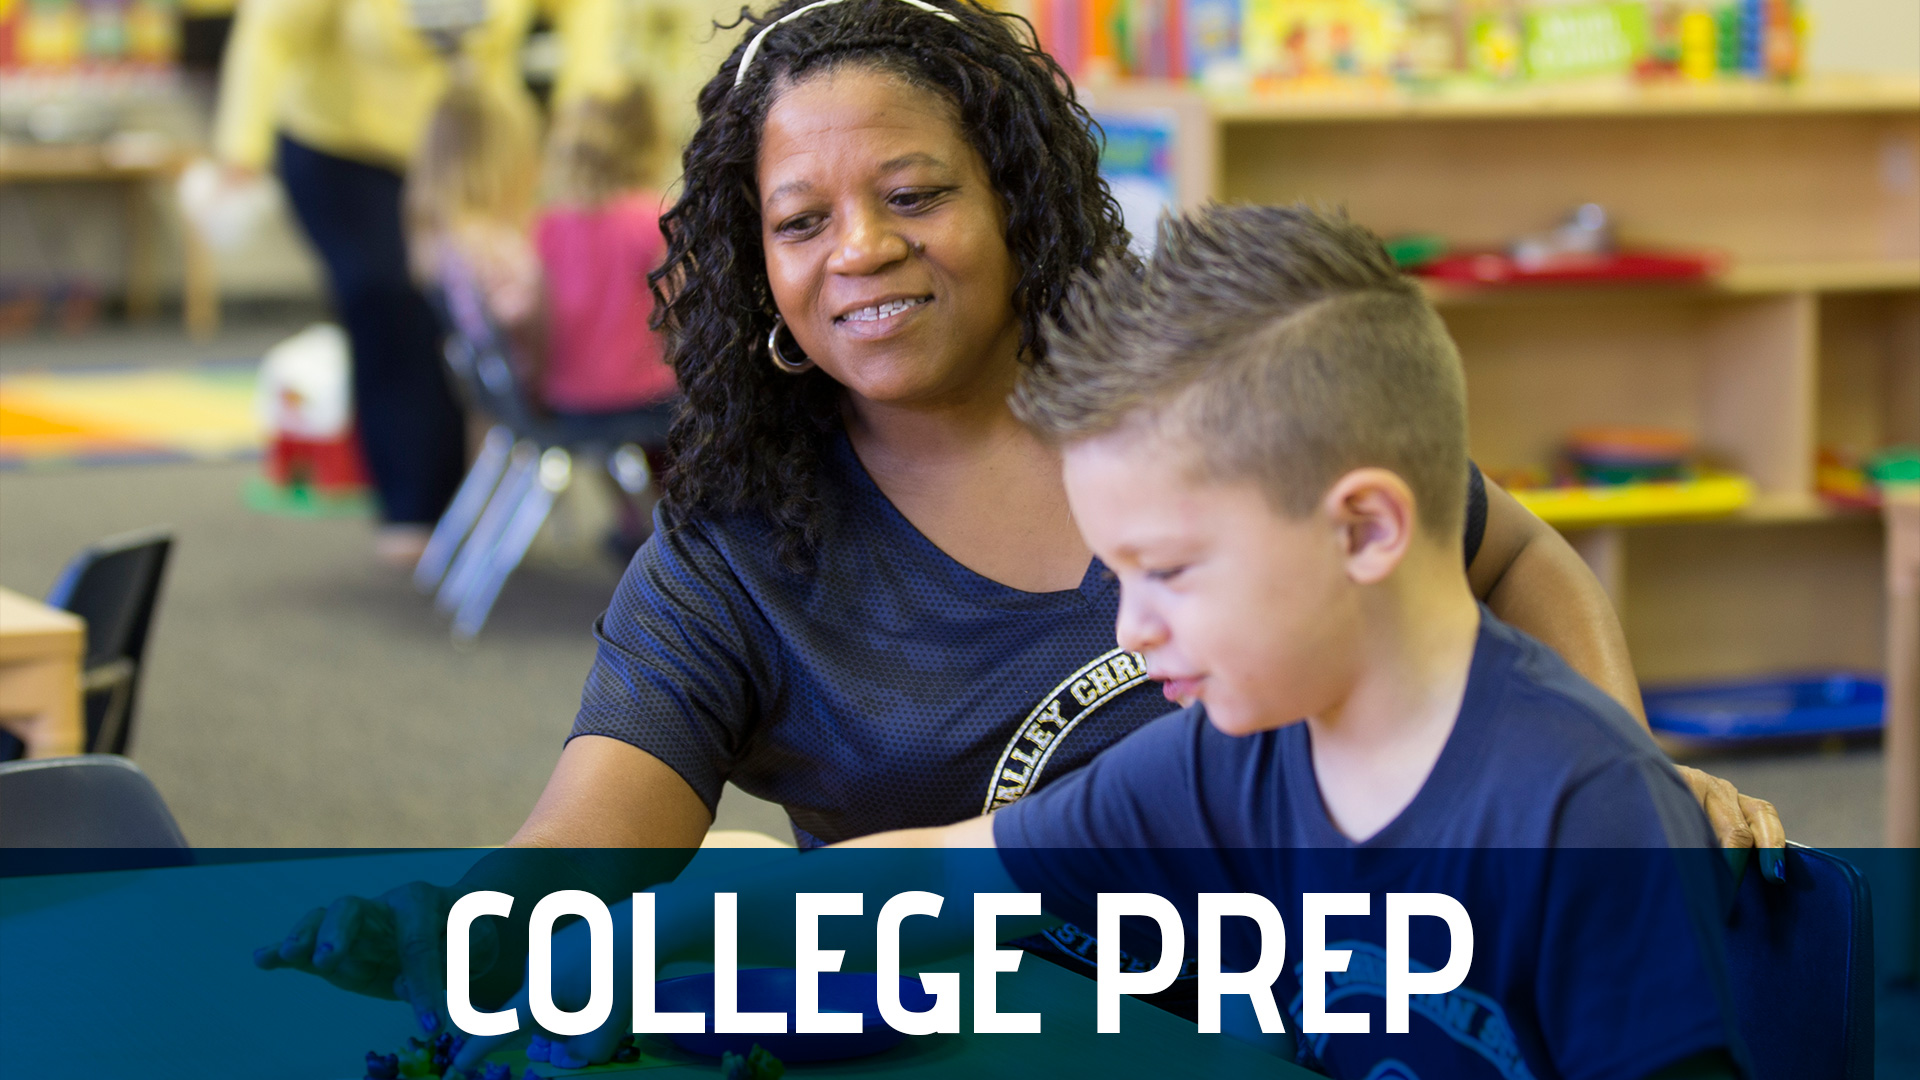 Preschool College Prep